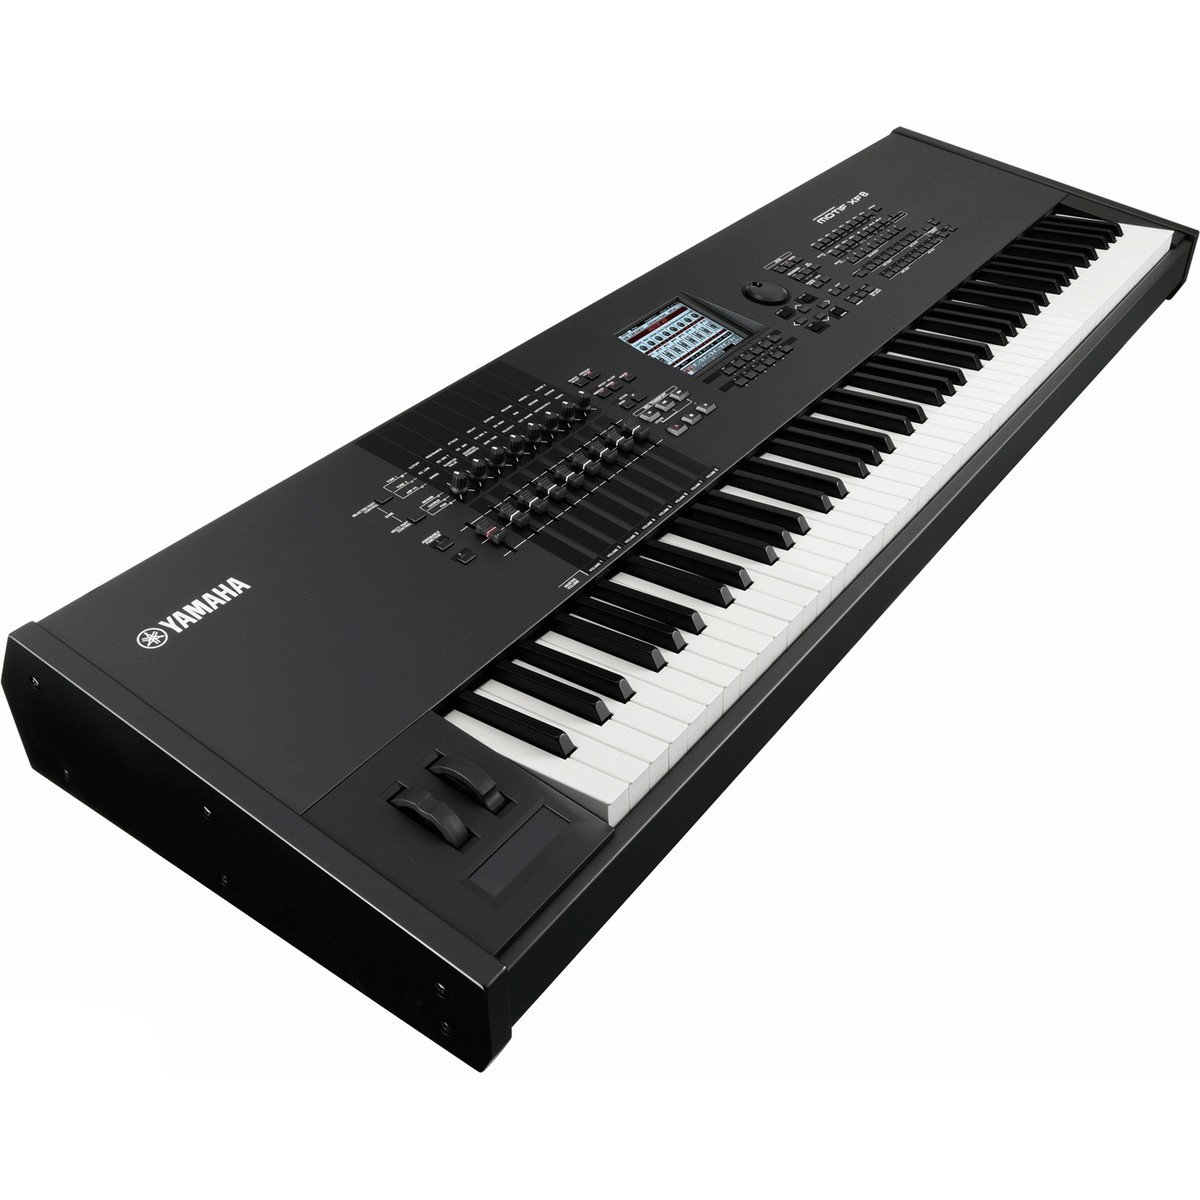 Latest Yamaha Keyboard Workstation : yamaha motif xf8 keyboard workstation nearly new at gear4music ~ Hamham.info Haus und Dekorationen